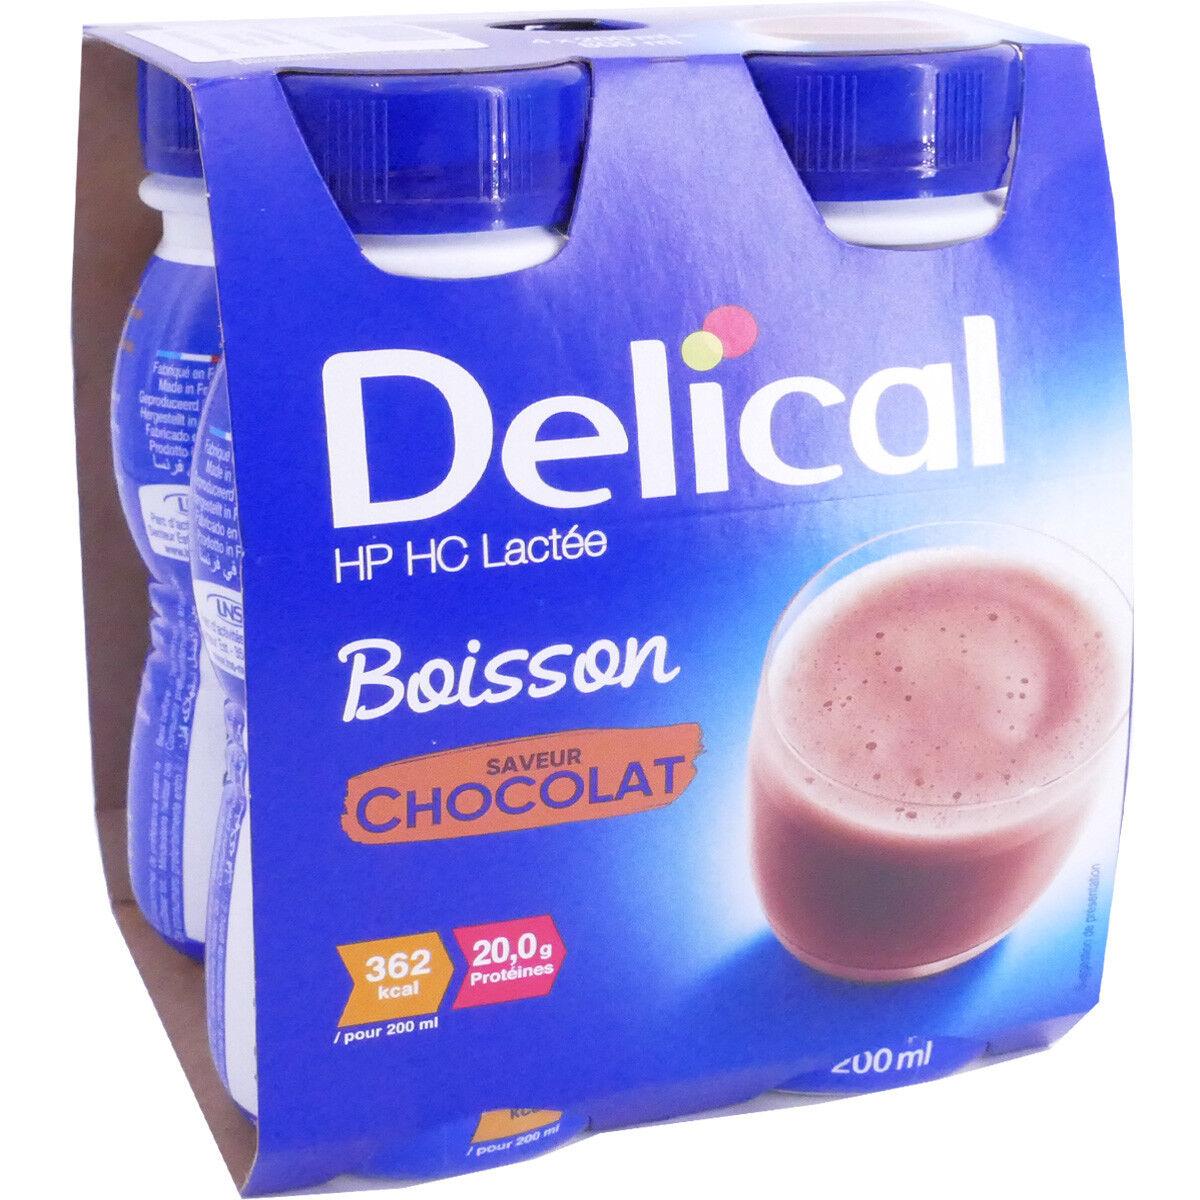 Delical boisson chocolat 4 x200ml